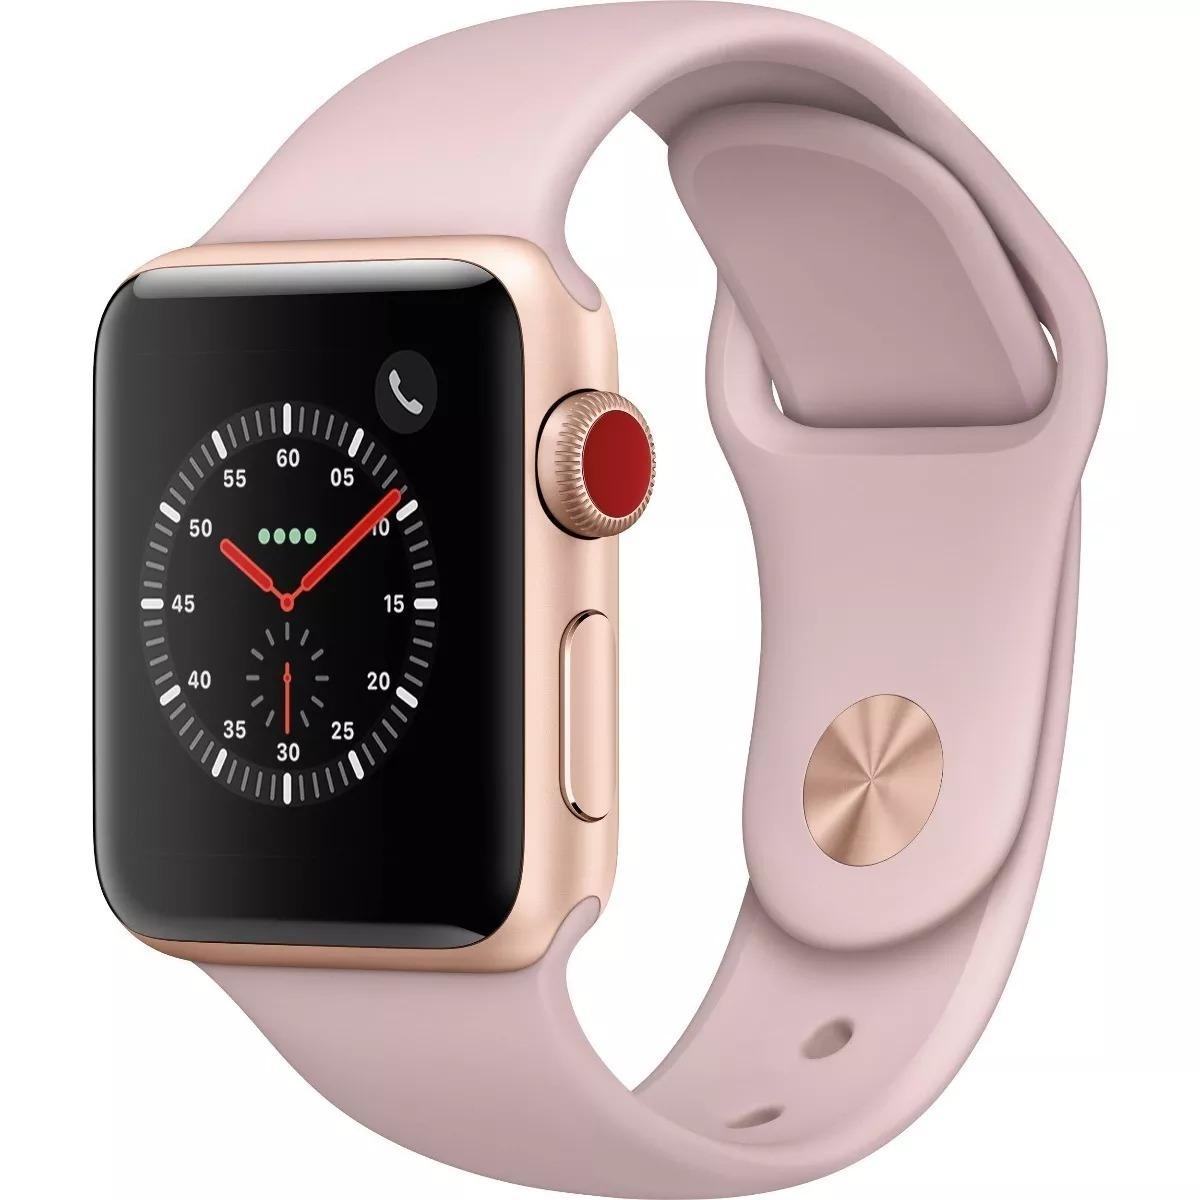 673a7b8cf91 Tag  Apple Watch Celular Vale A Pena